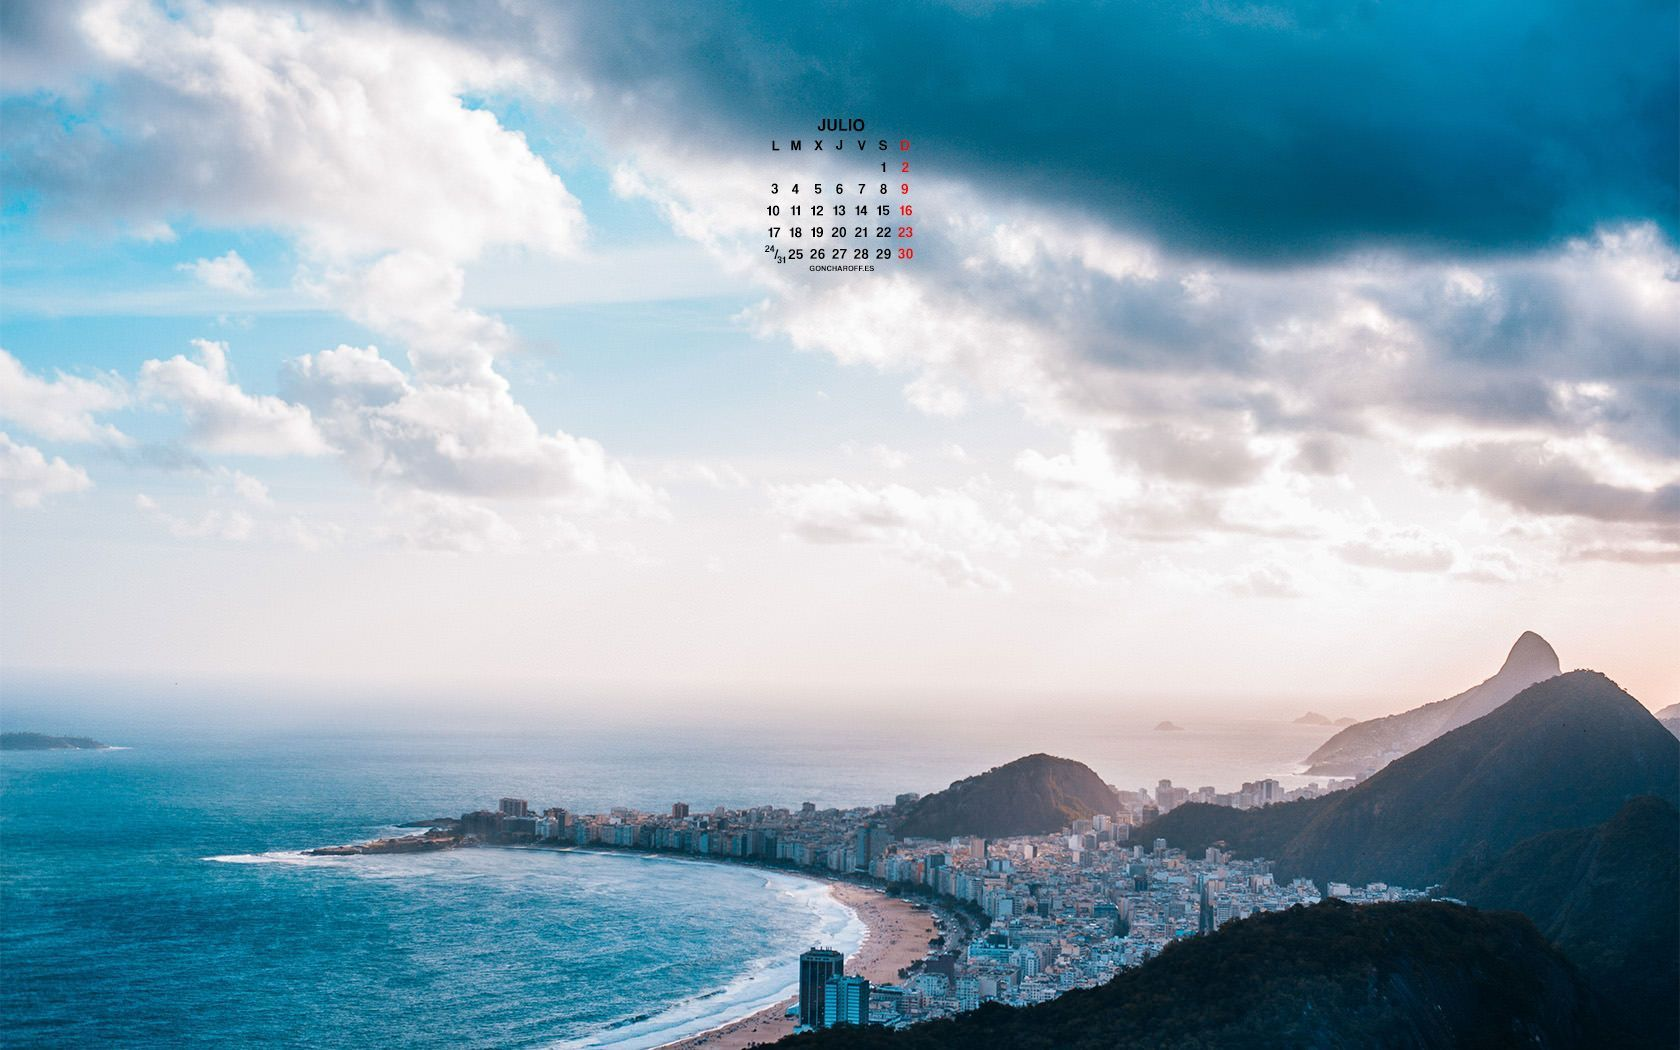 Calendario de Junio 2017 descargar gratis